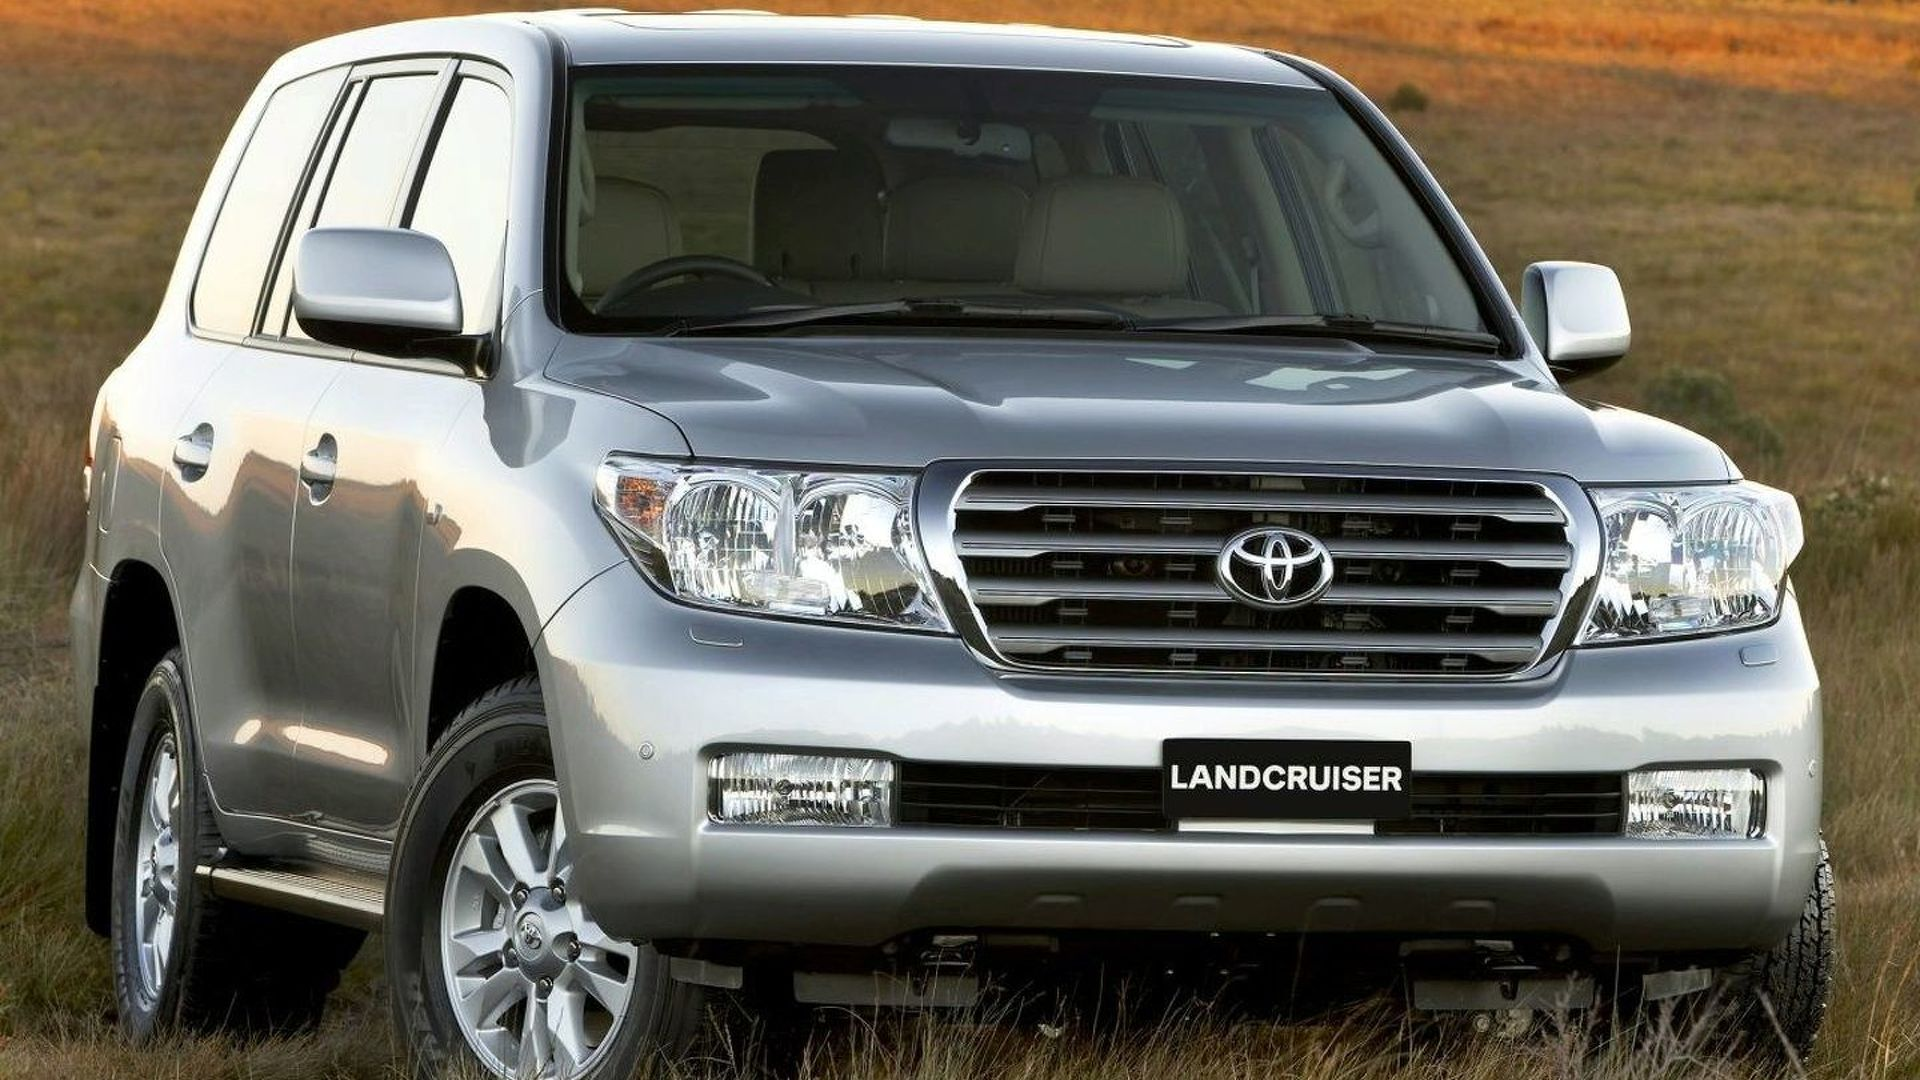 New Toyota LandCruiser at Sydney Motorshow